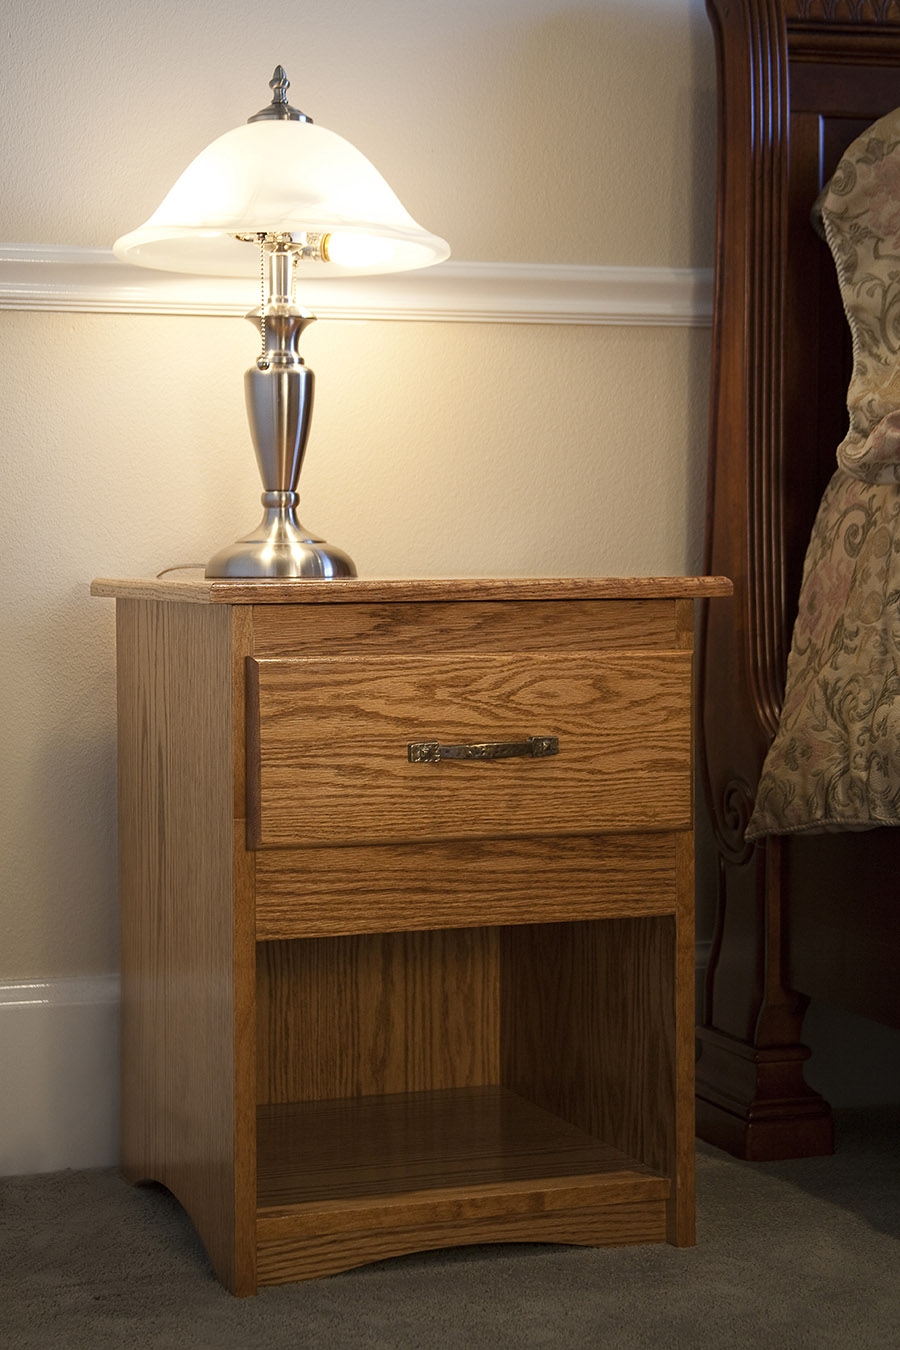 Bedroom Furniture Items